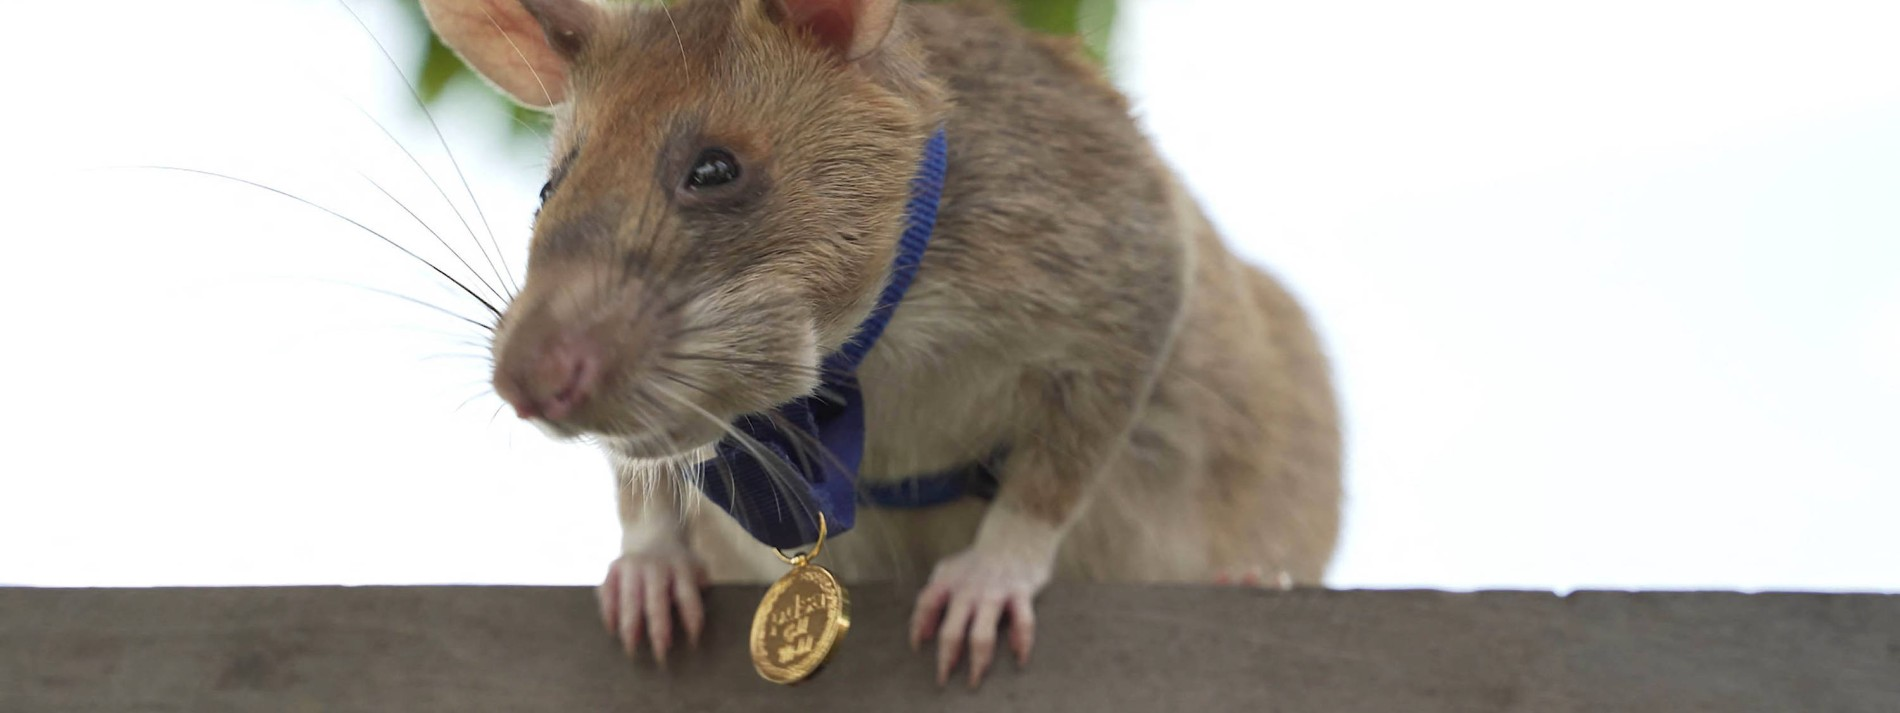 Minensuch-Ratte Magawa geht in Kambodscha in Rente